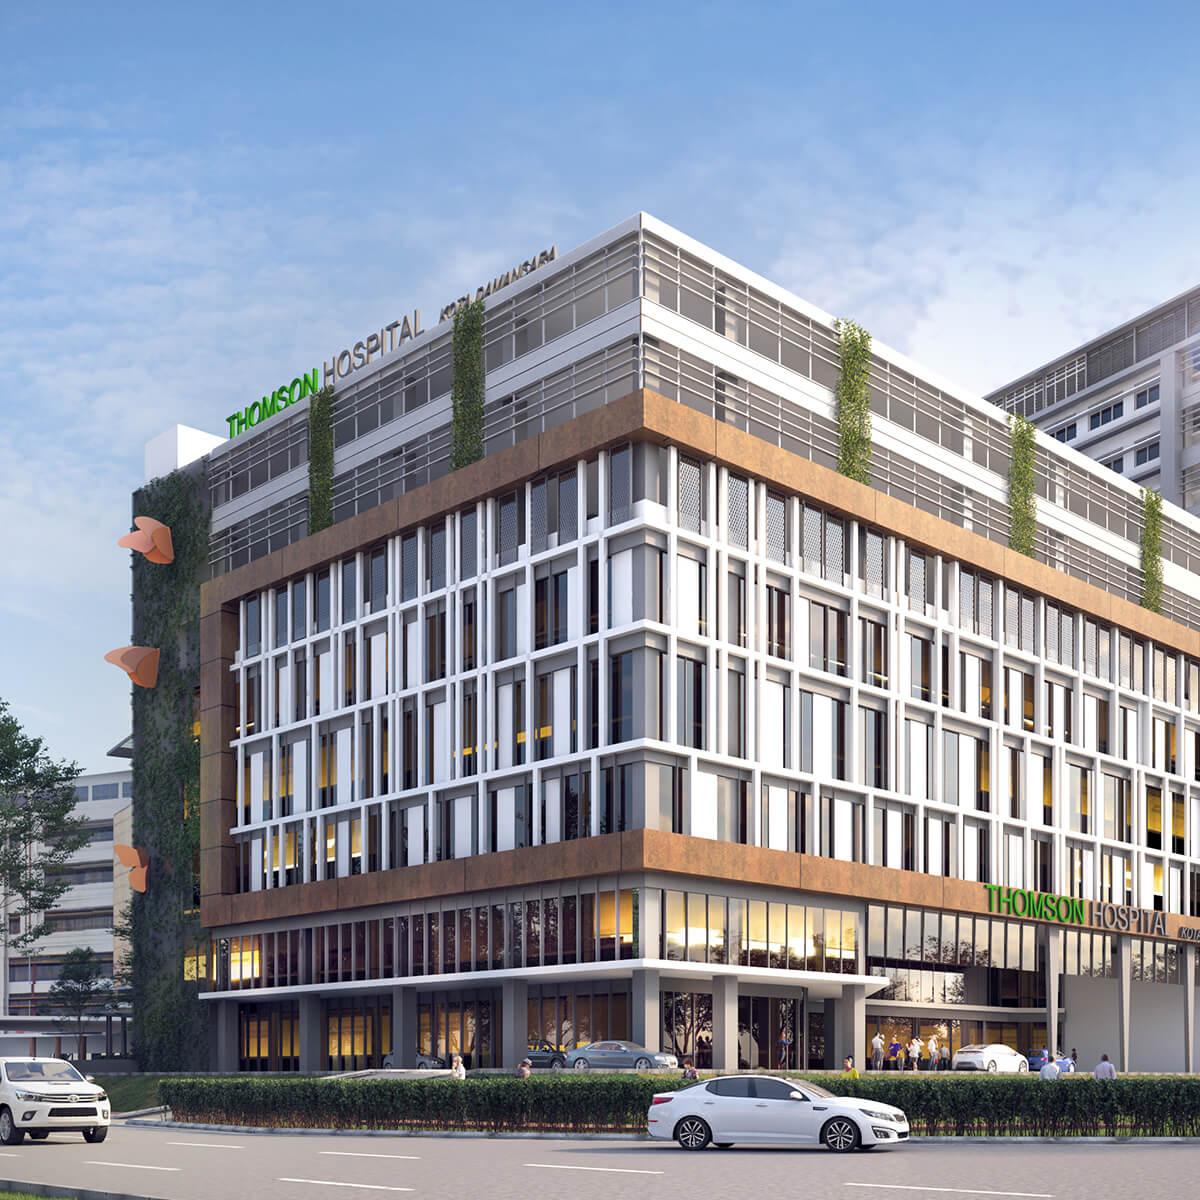 THKD Thomson Hospital Expansion 4